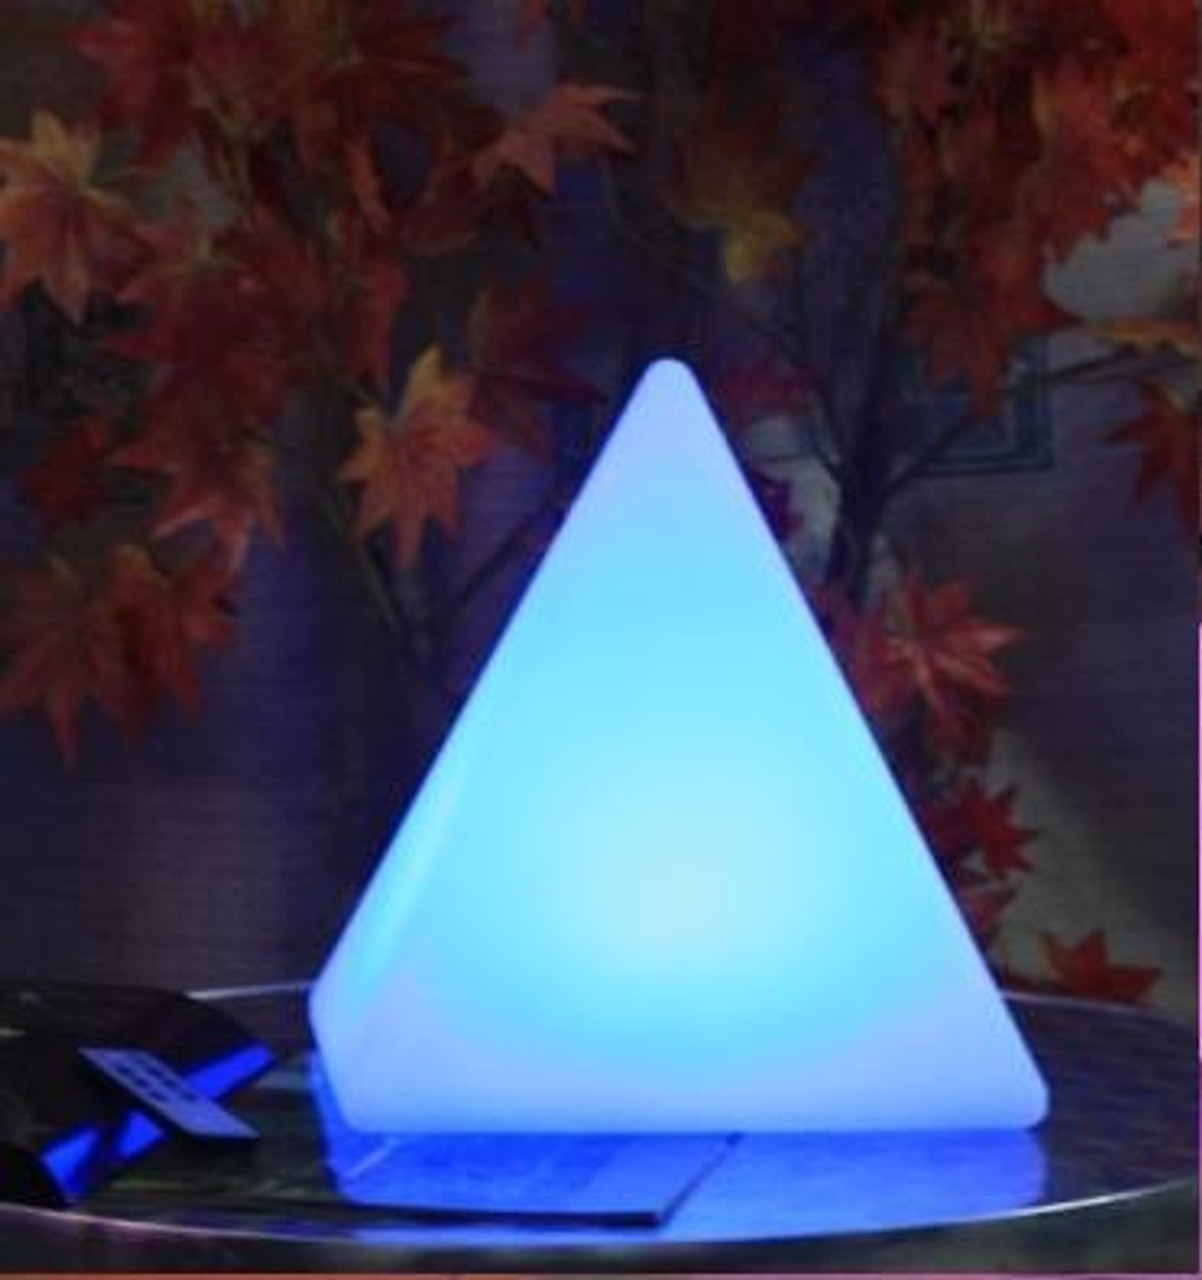 Led furniture, led pyramid , rave, nightclub, party,furniture